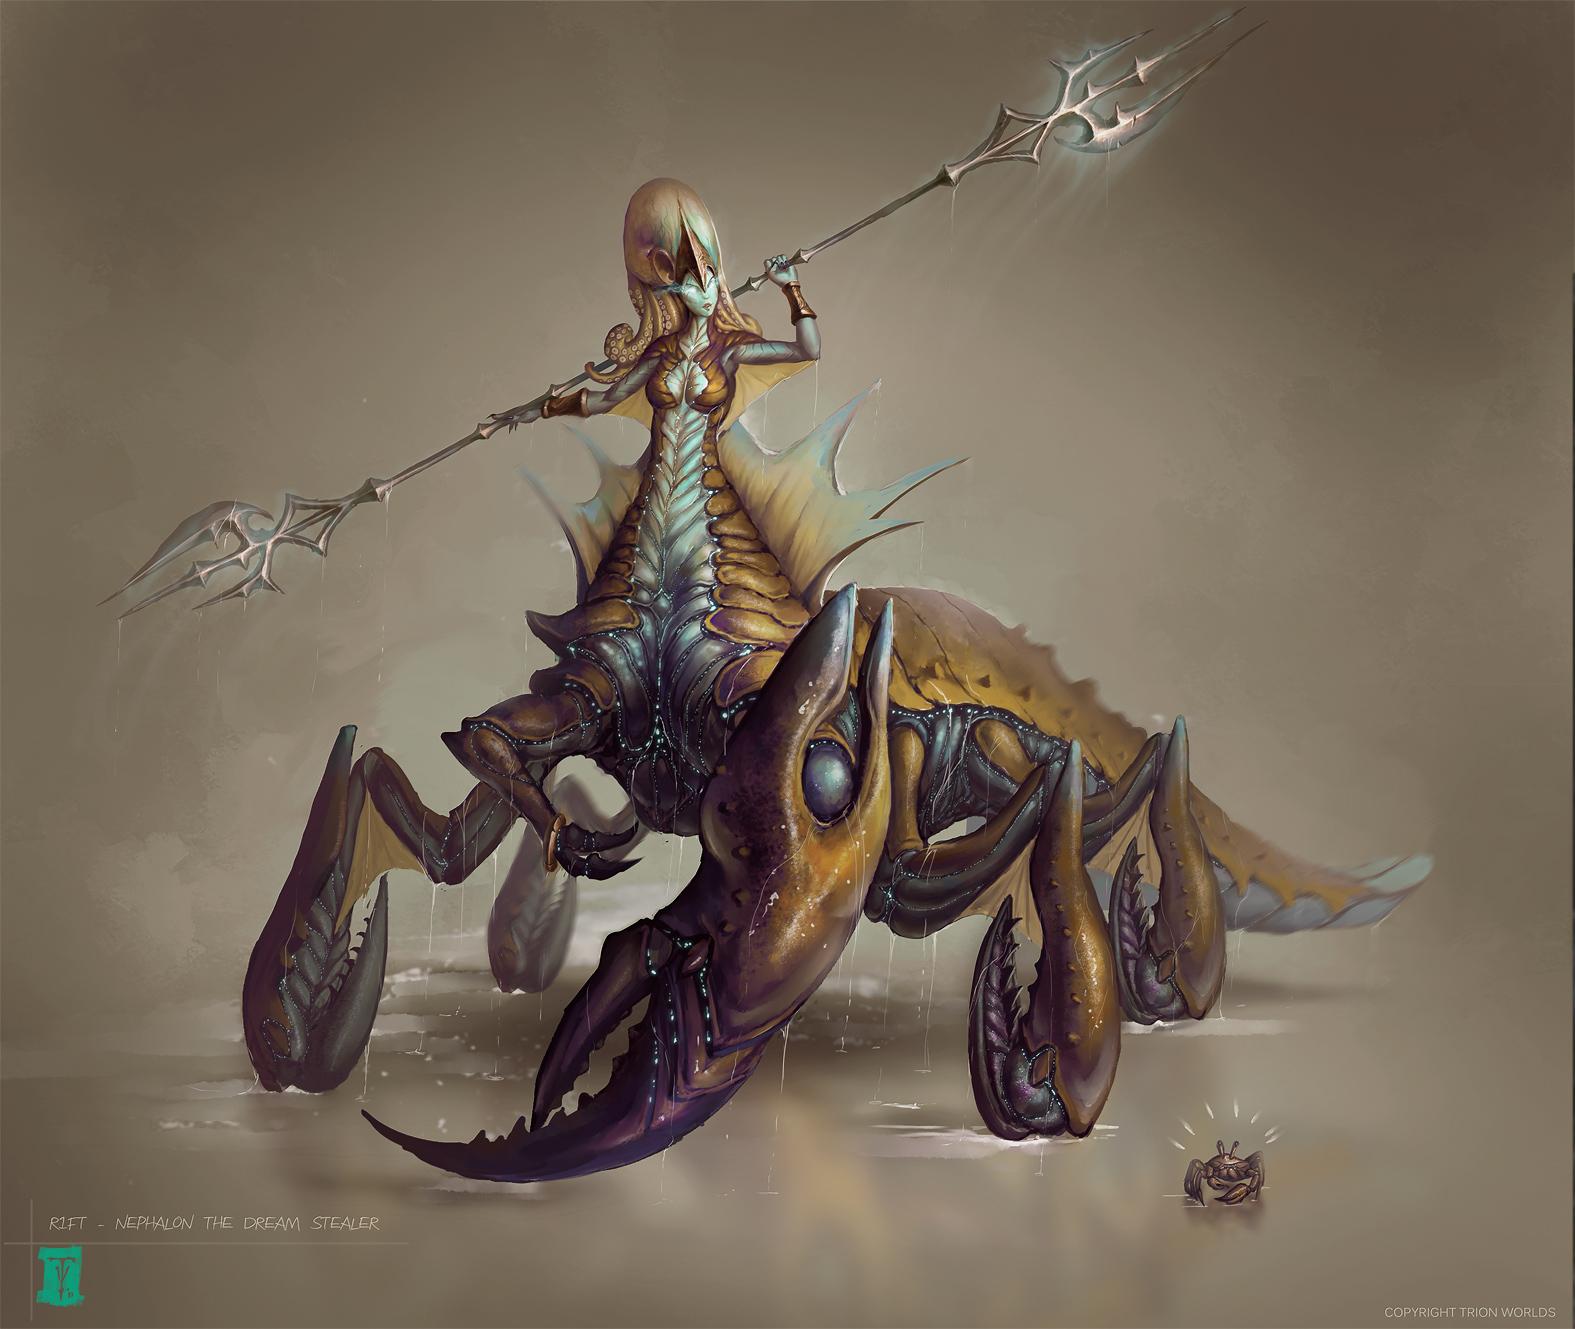 Nephalon the Dream Stealer by ArtofTy